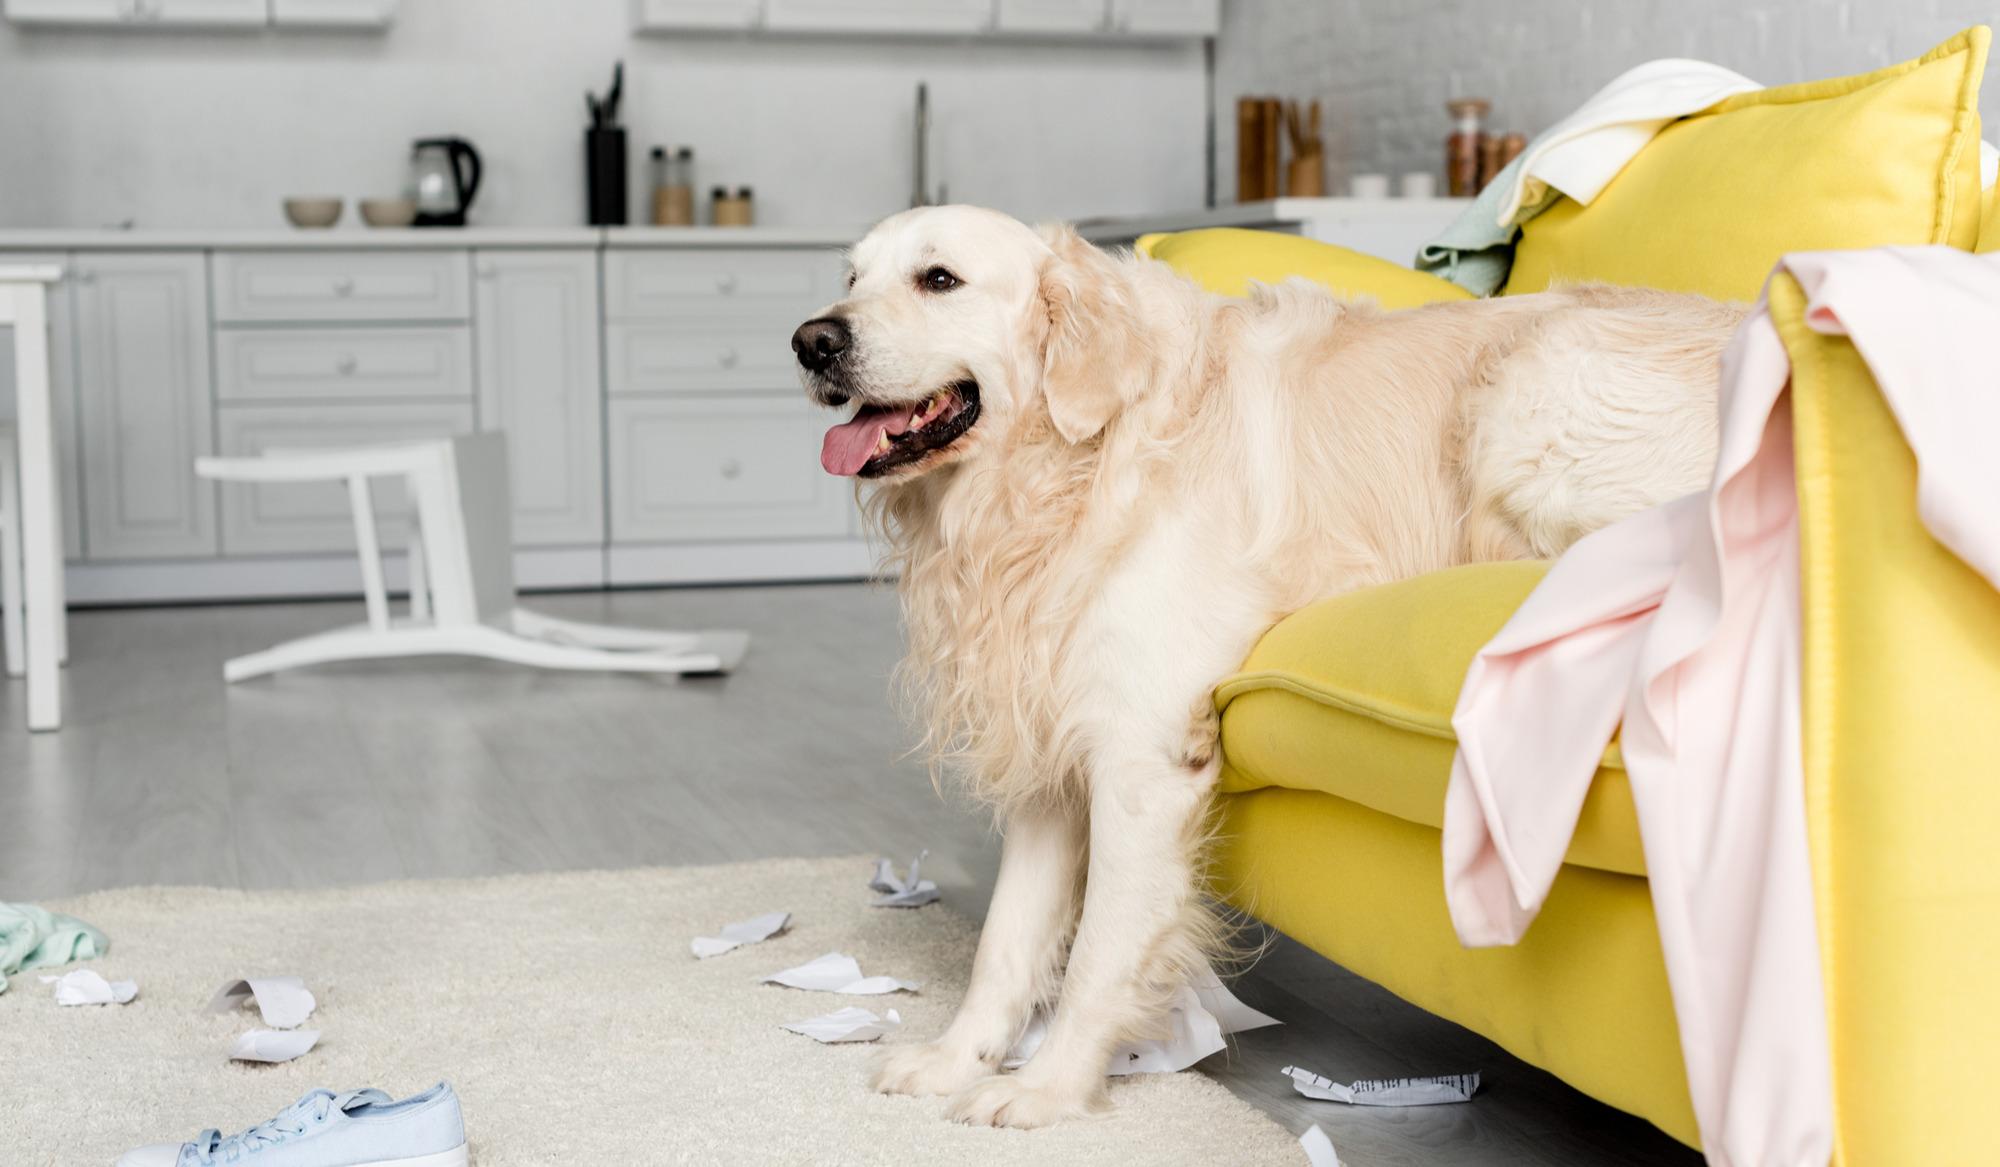 Golden retriever in a dirty apartment